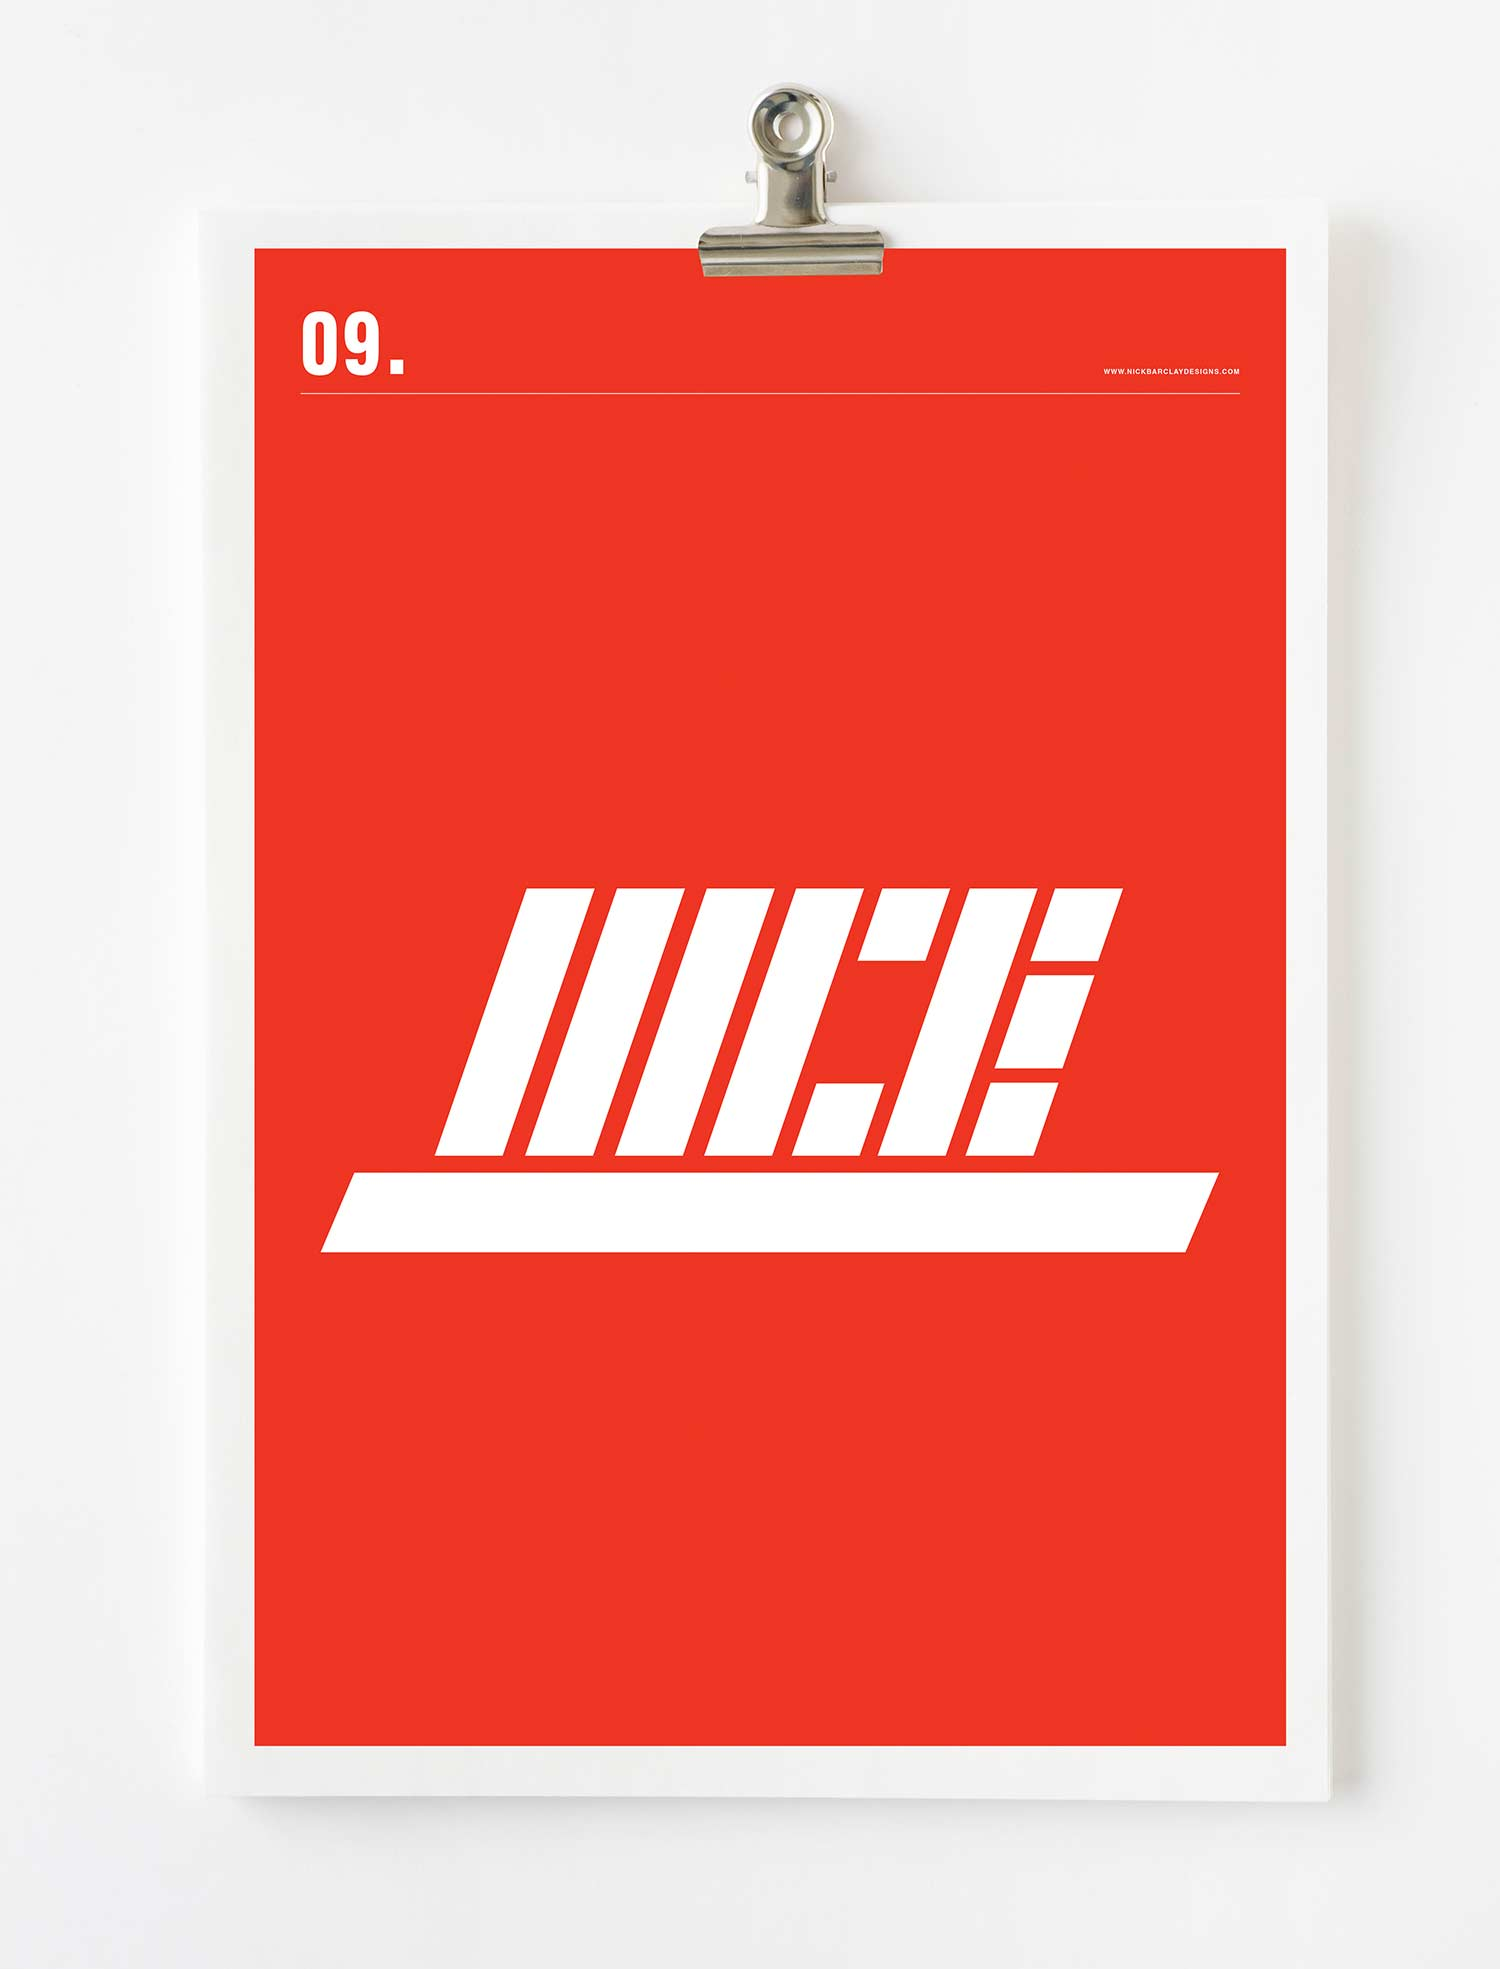 line-logos_Nick-Barclay_09 Line Logos